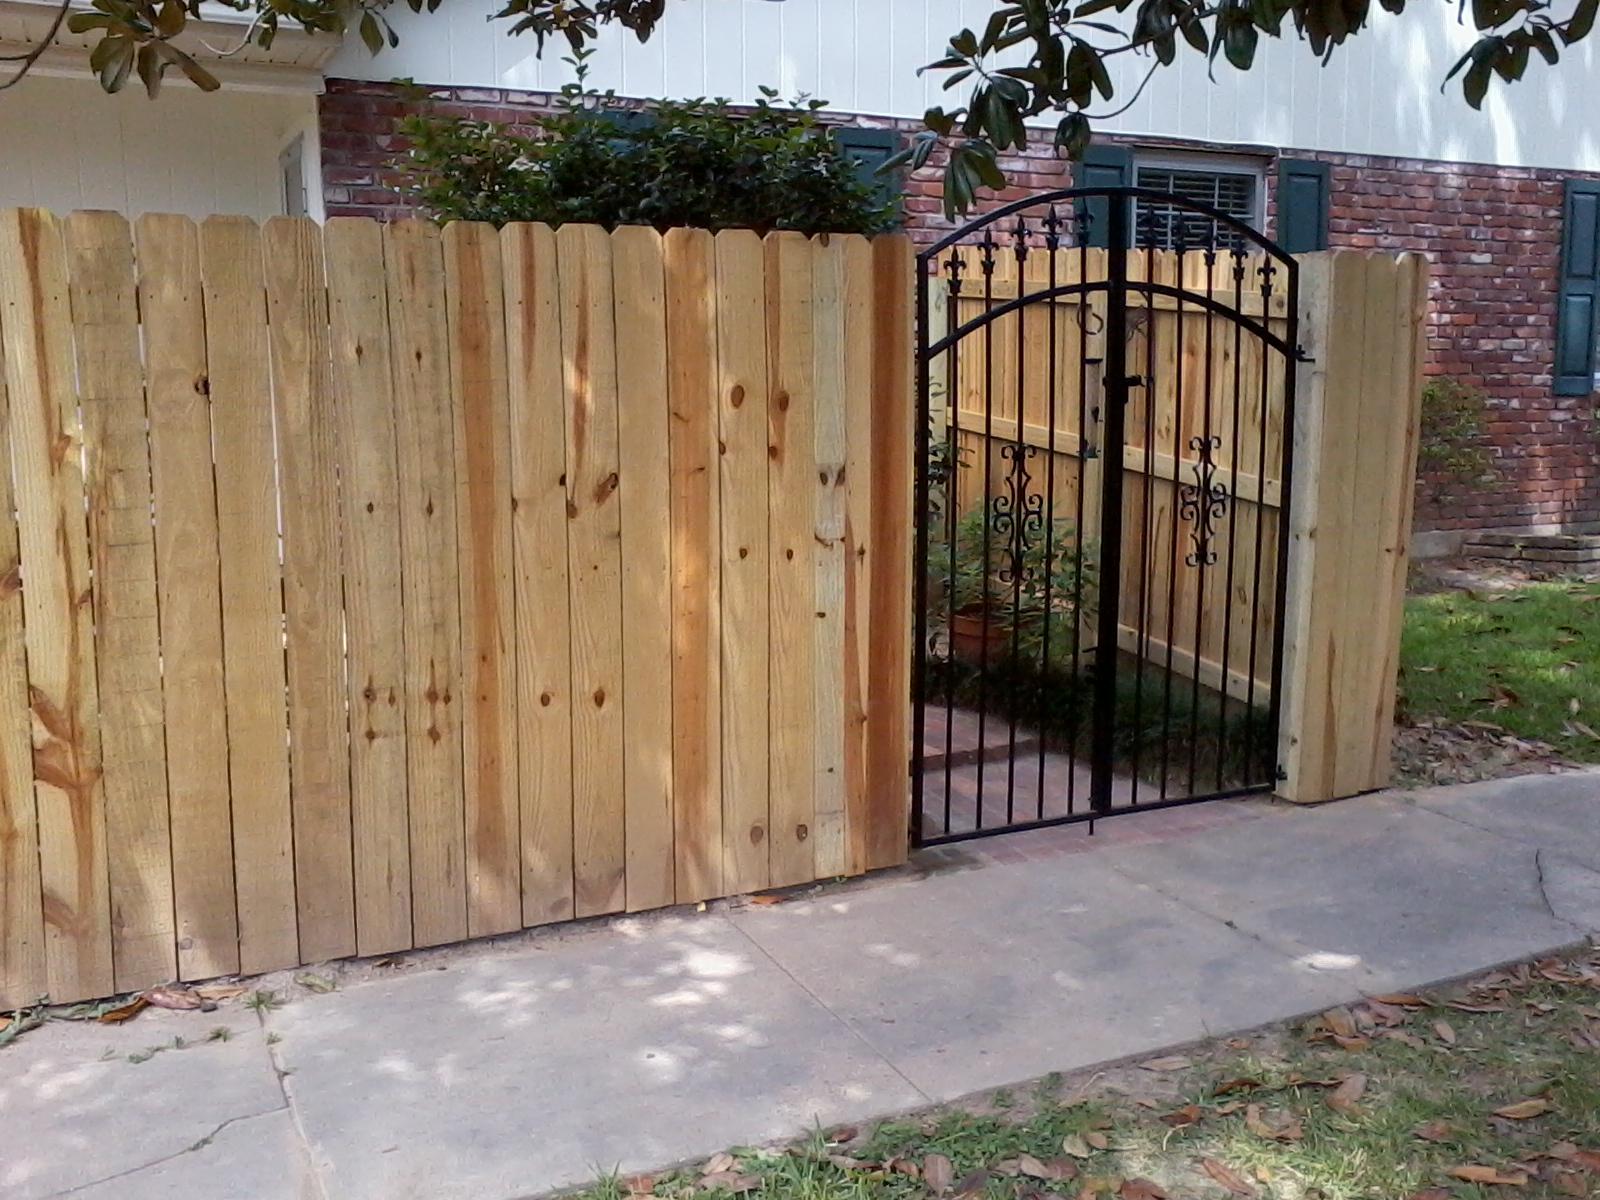 Kings Fence And Services Llc Baton Rouge La 70810